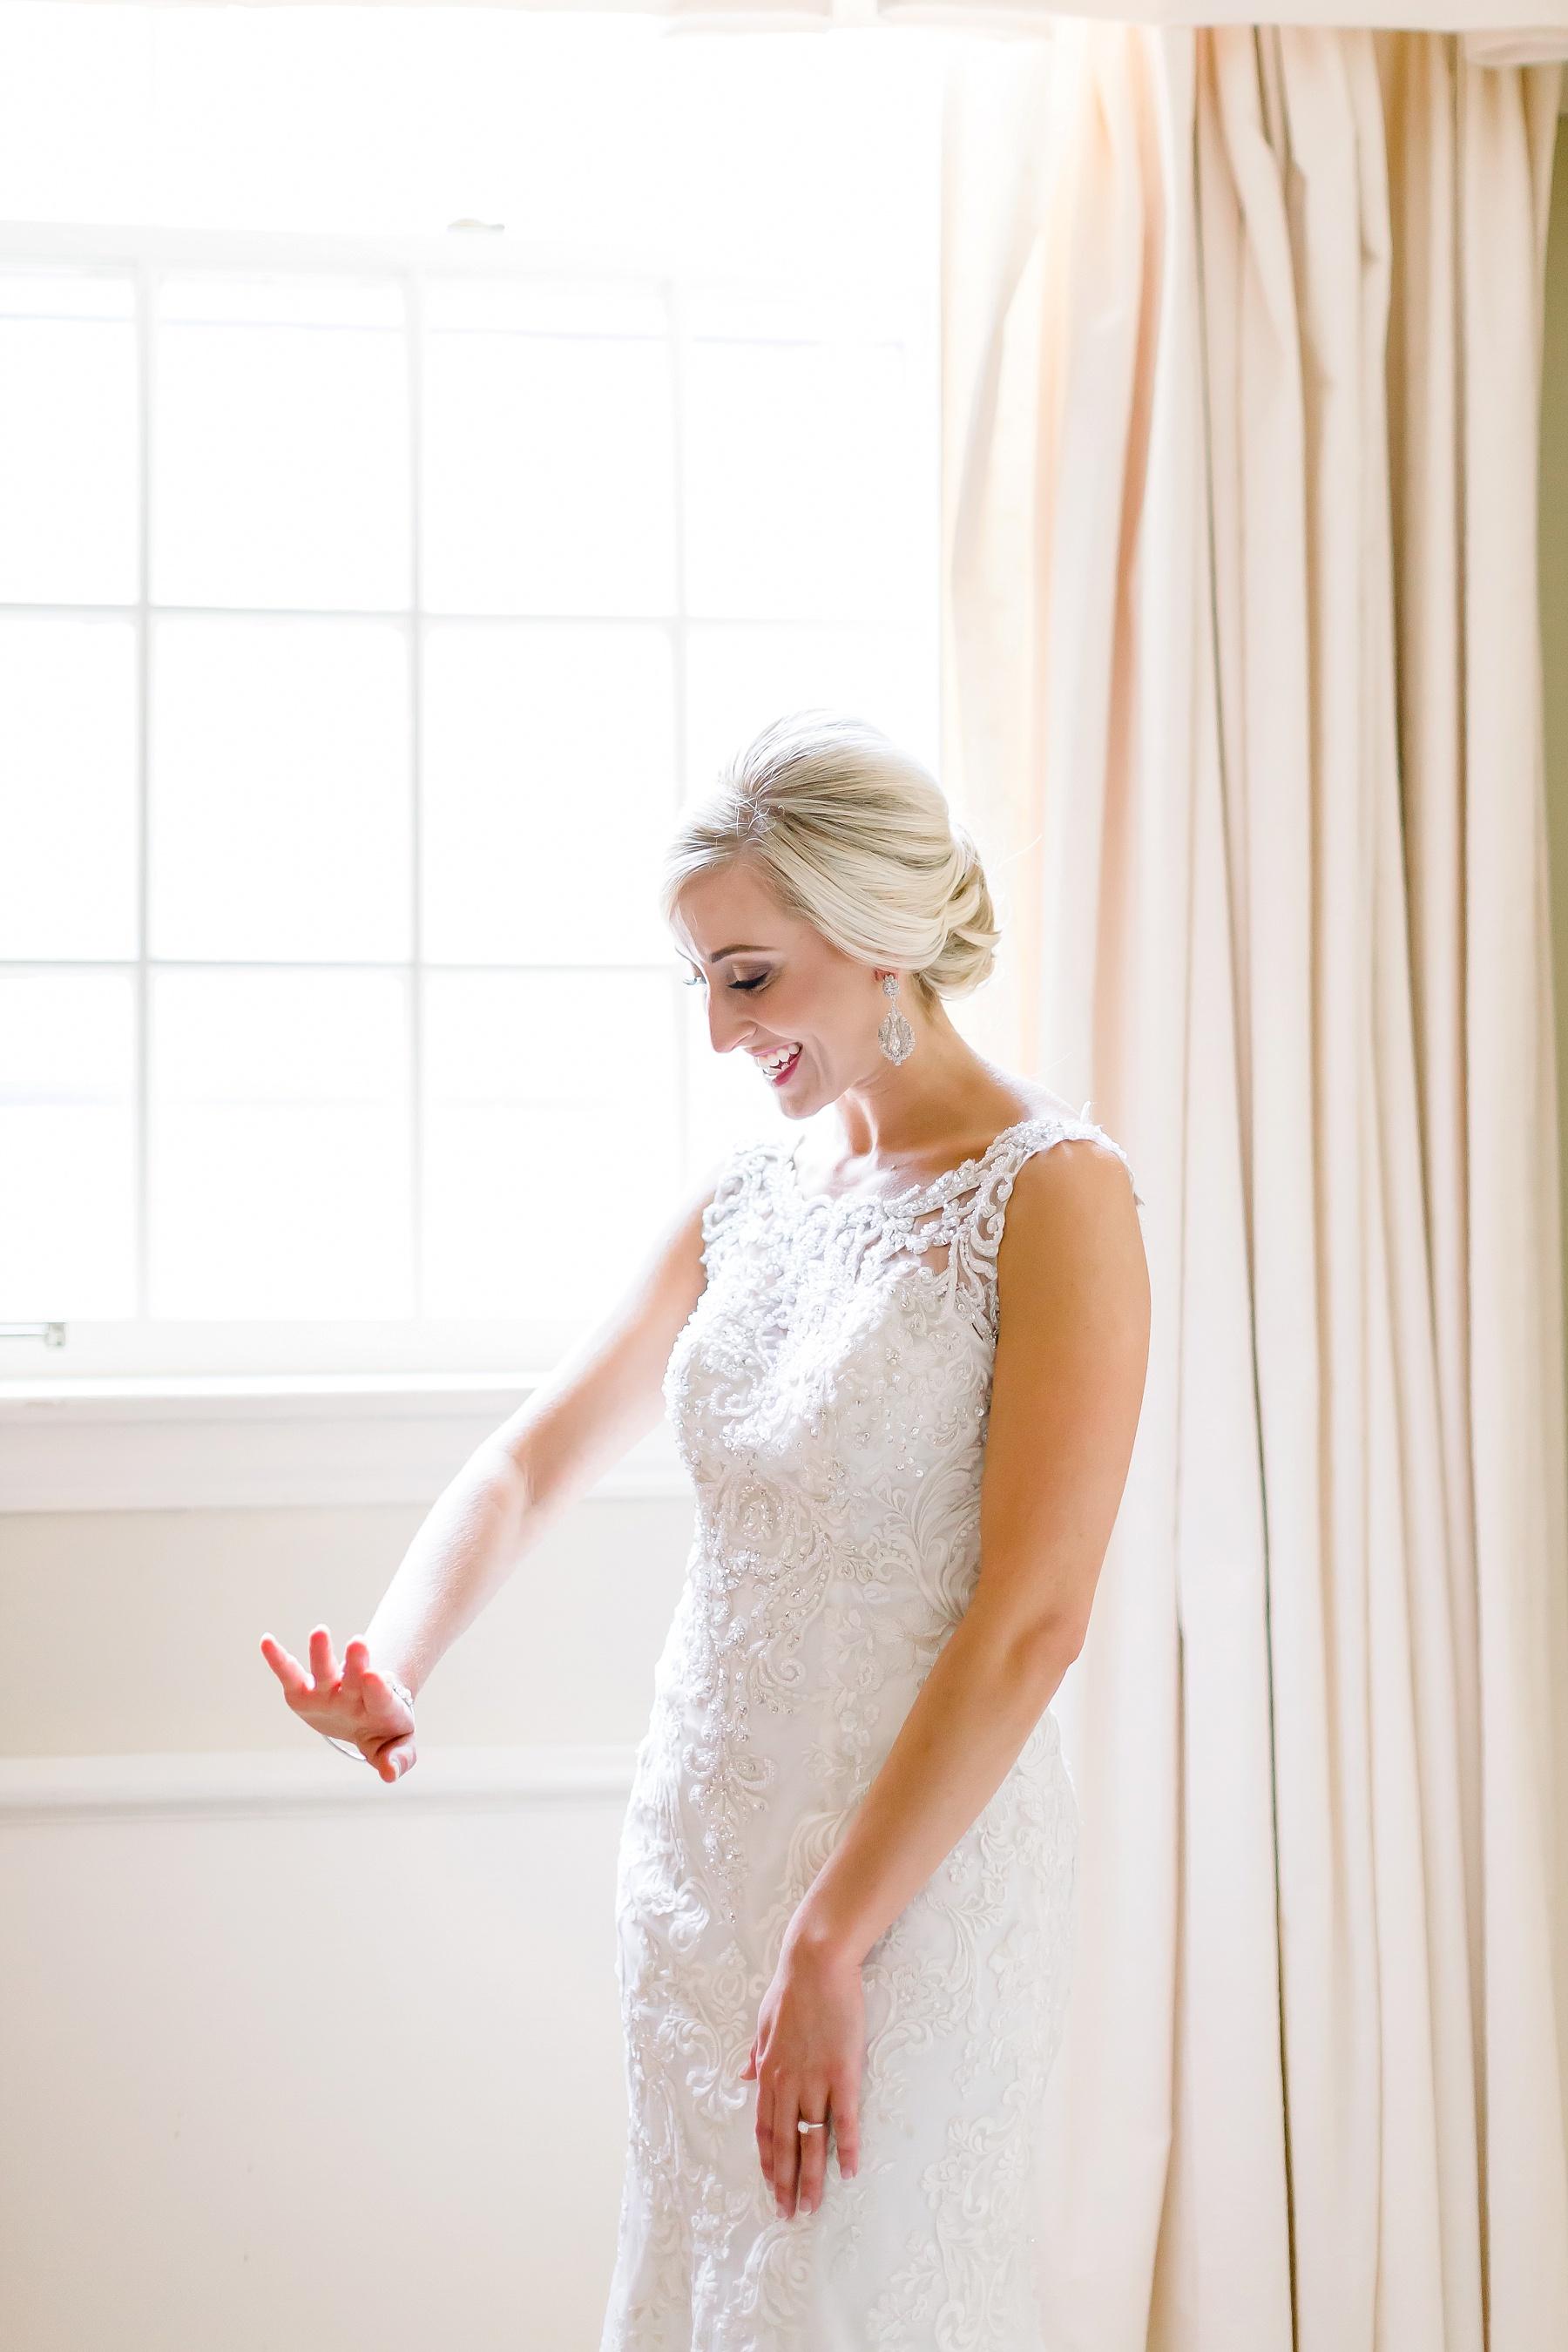 midwest-adventurous-wedding-photographer-elizabeth-ladean-photography-photo_4699.jpg